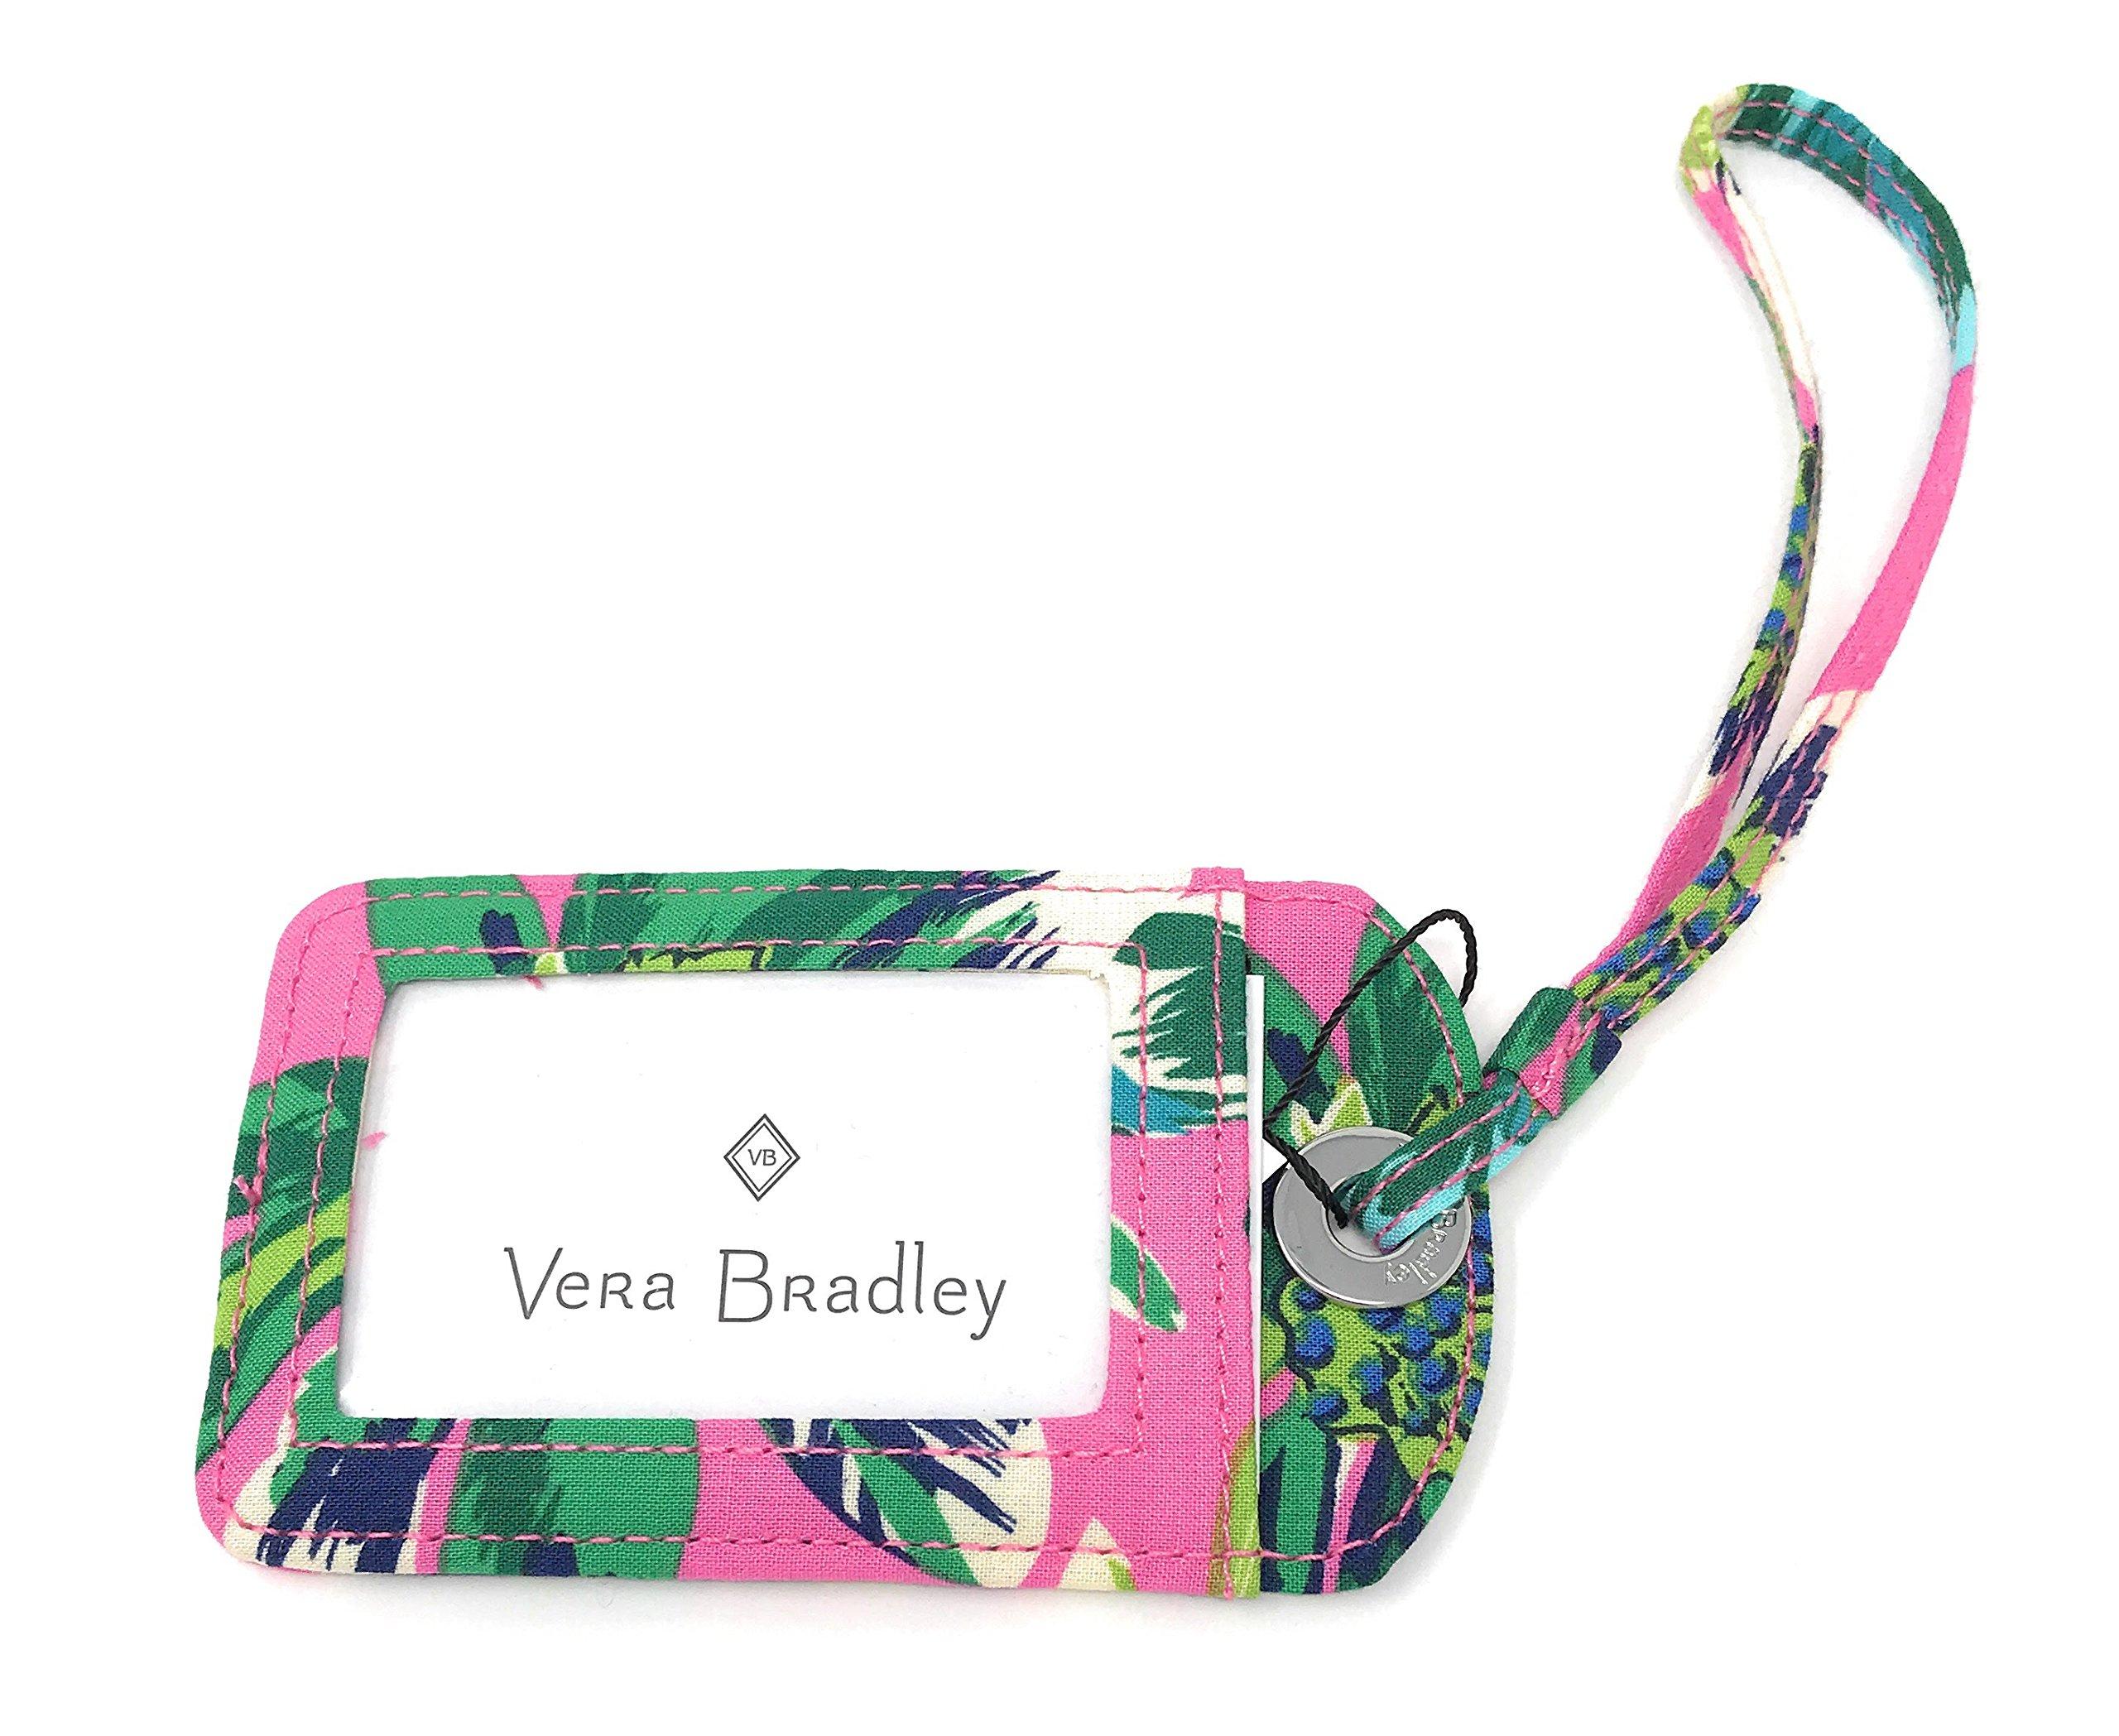 Vera Bradley Luggage Tag in Tropical Paradise